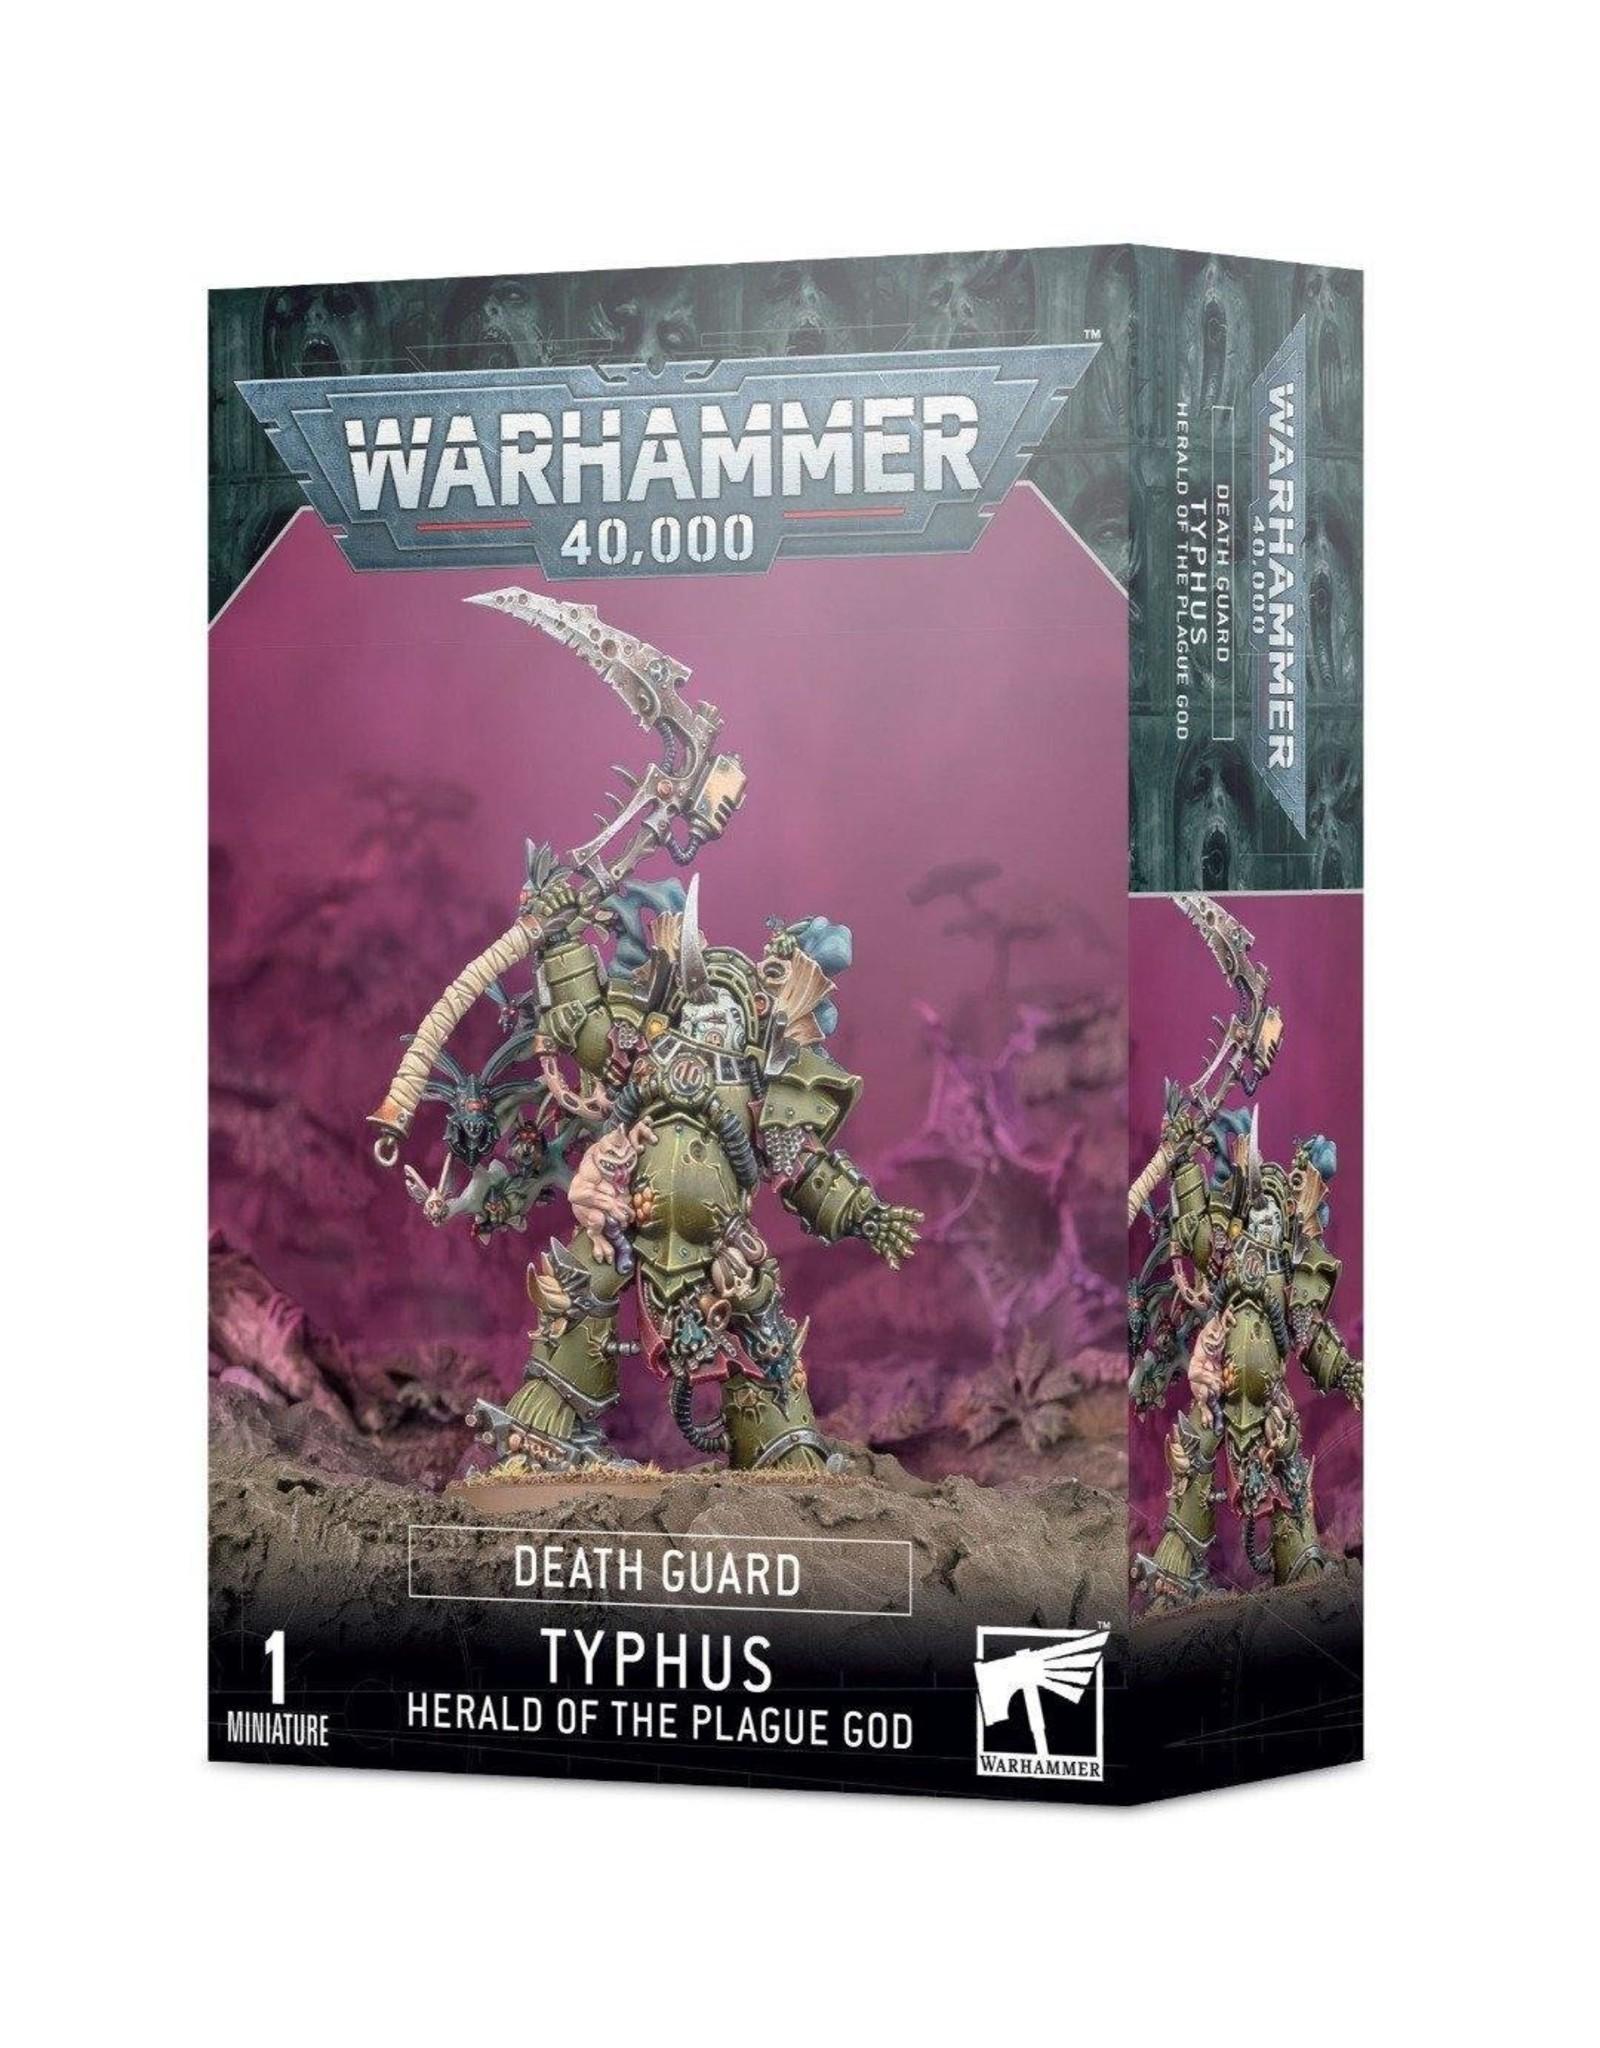 Warhammer 40K Death Guard: Typhus, Herald of the Plague God